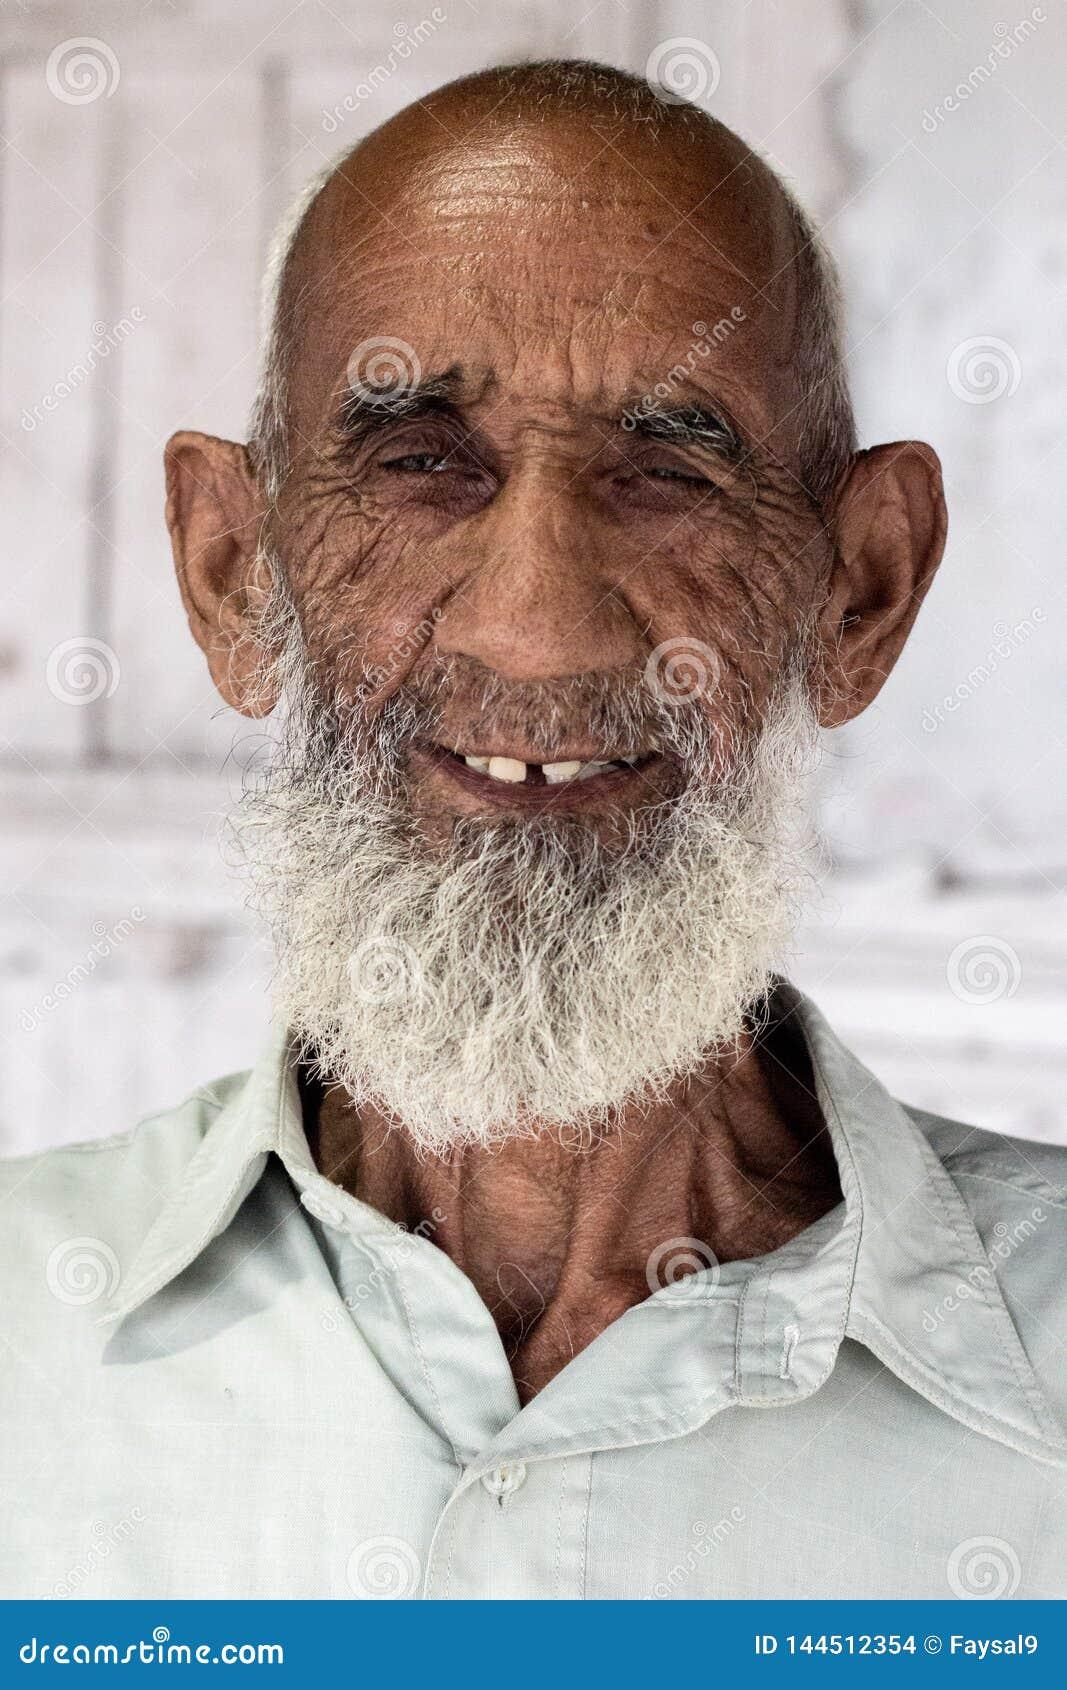 Old man pakistani